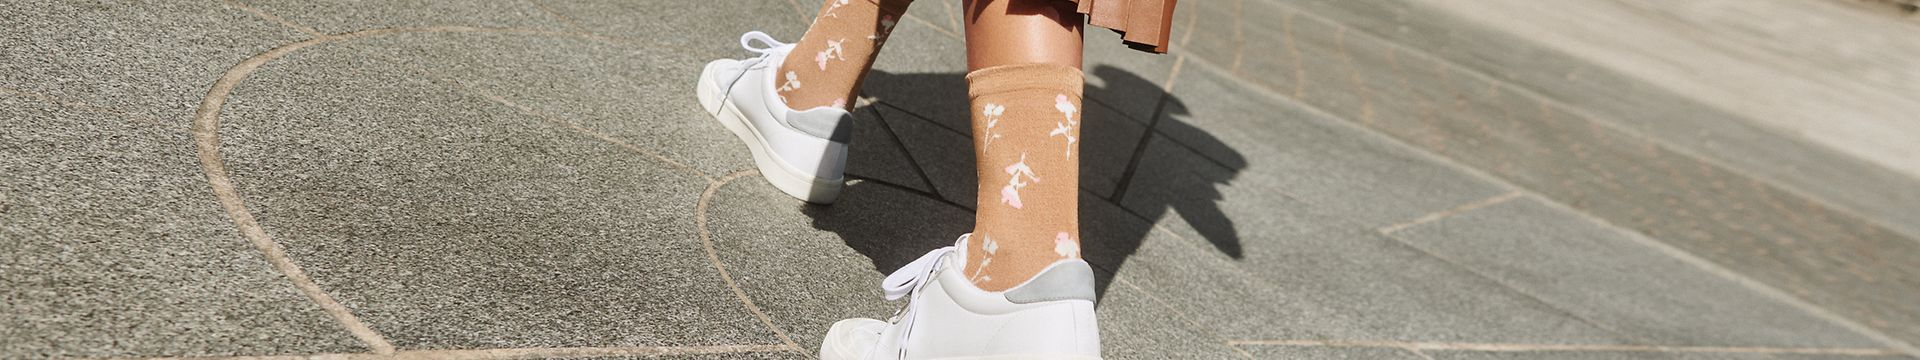 352021 - women - accessories - socks - tc banner - IMG